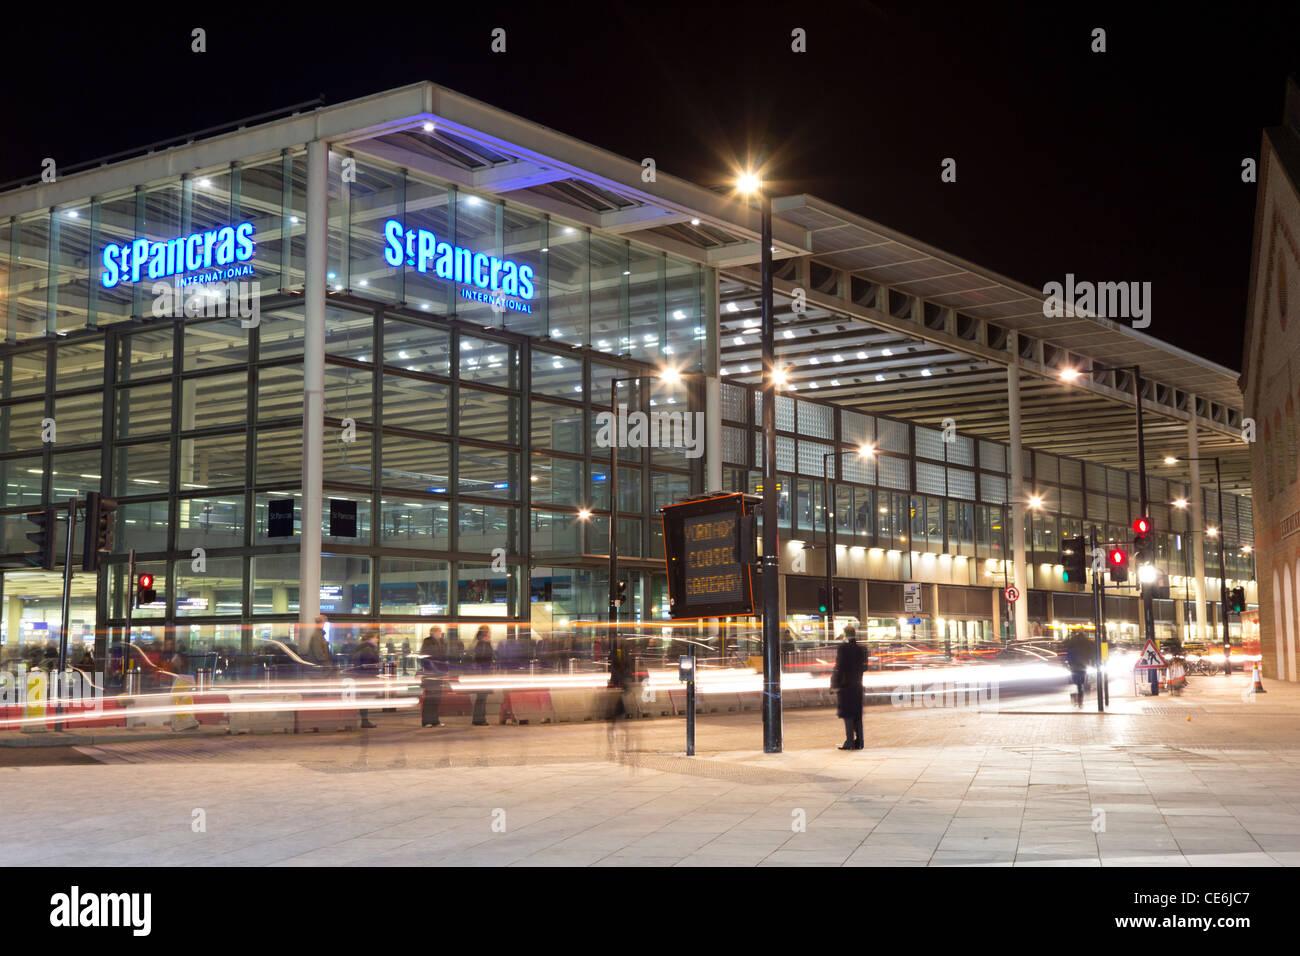 St Pancras Station - London - Stock Image